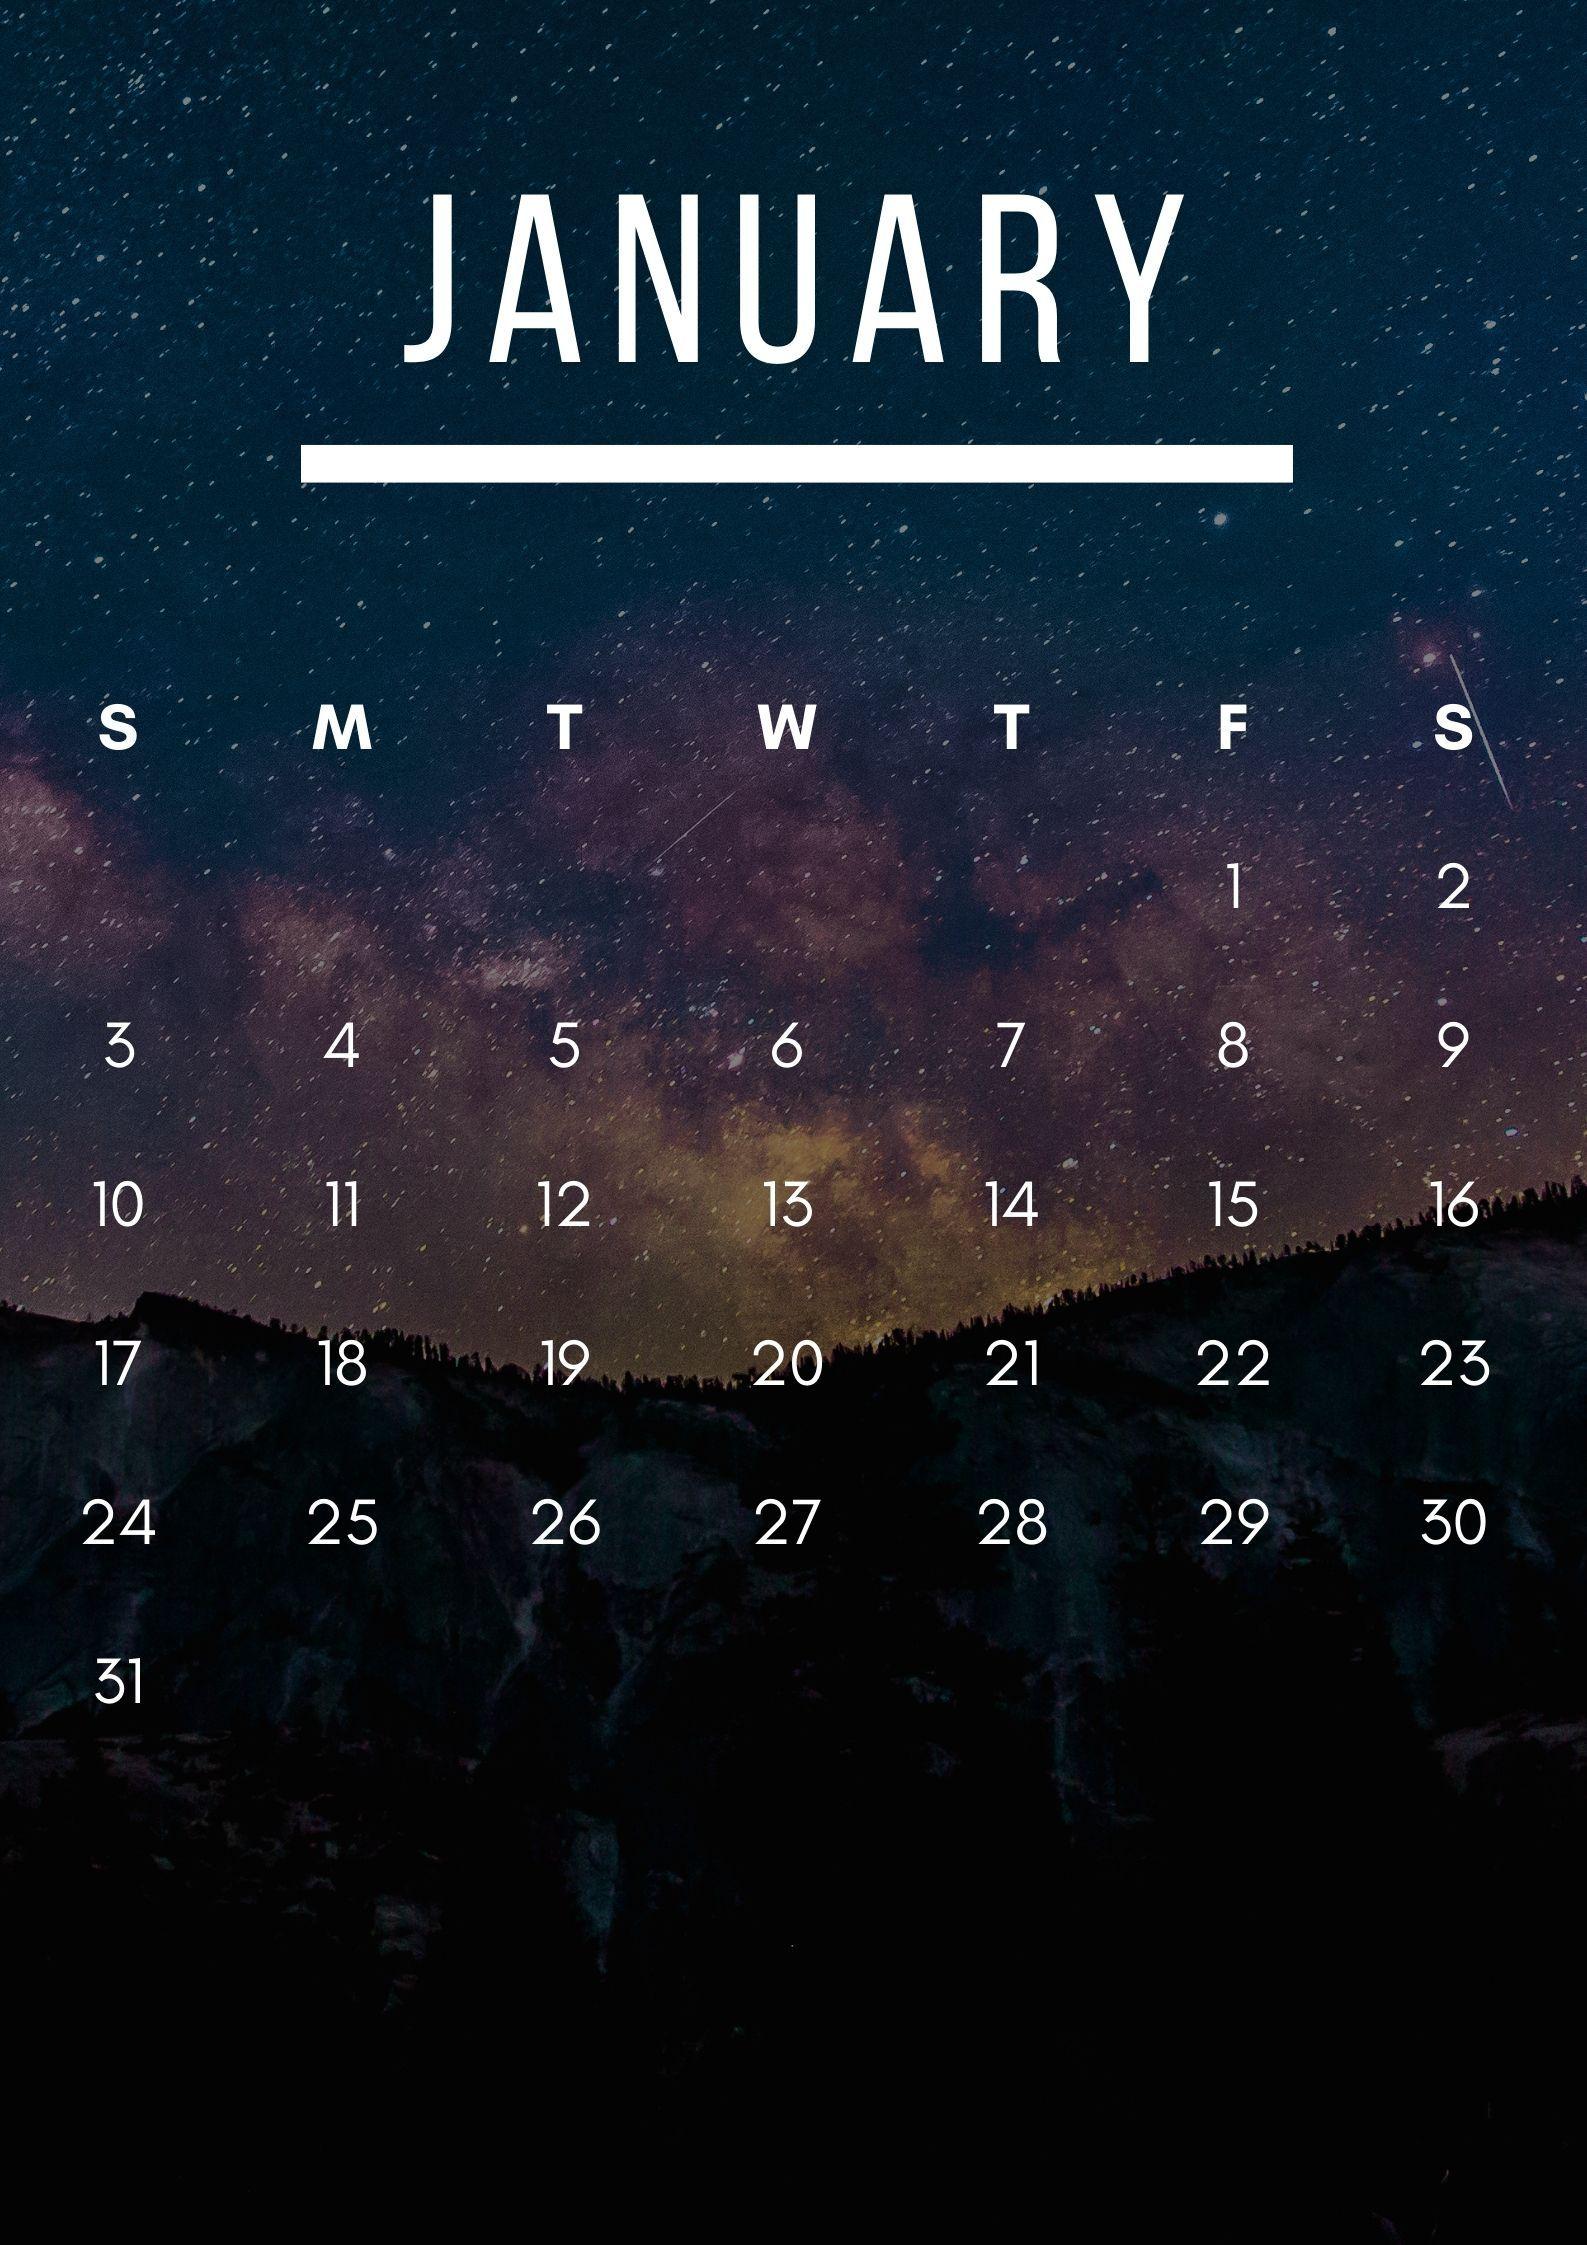 iPhone Calendar January 2021 Wallpapers - Wallpaper Cave